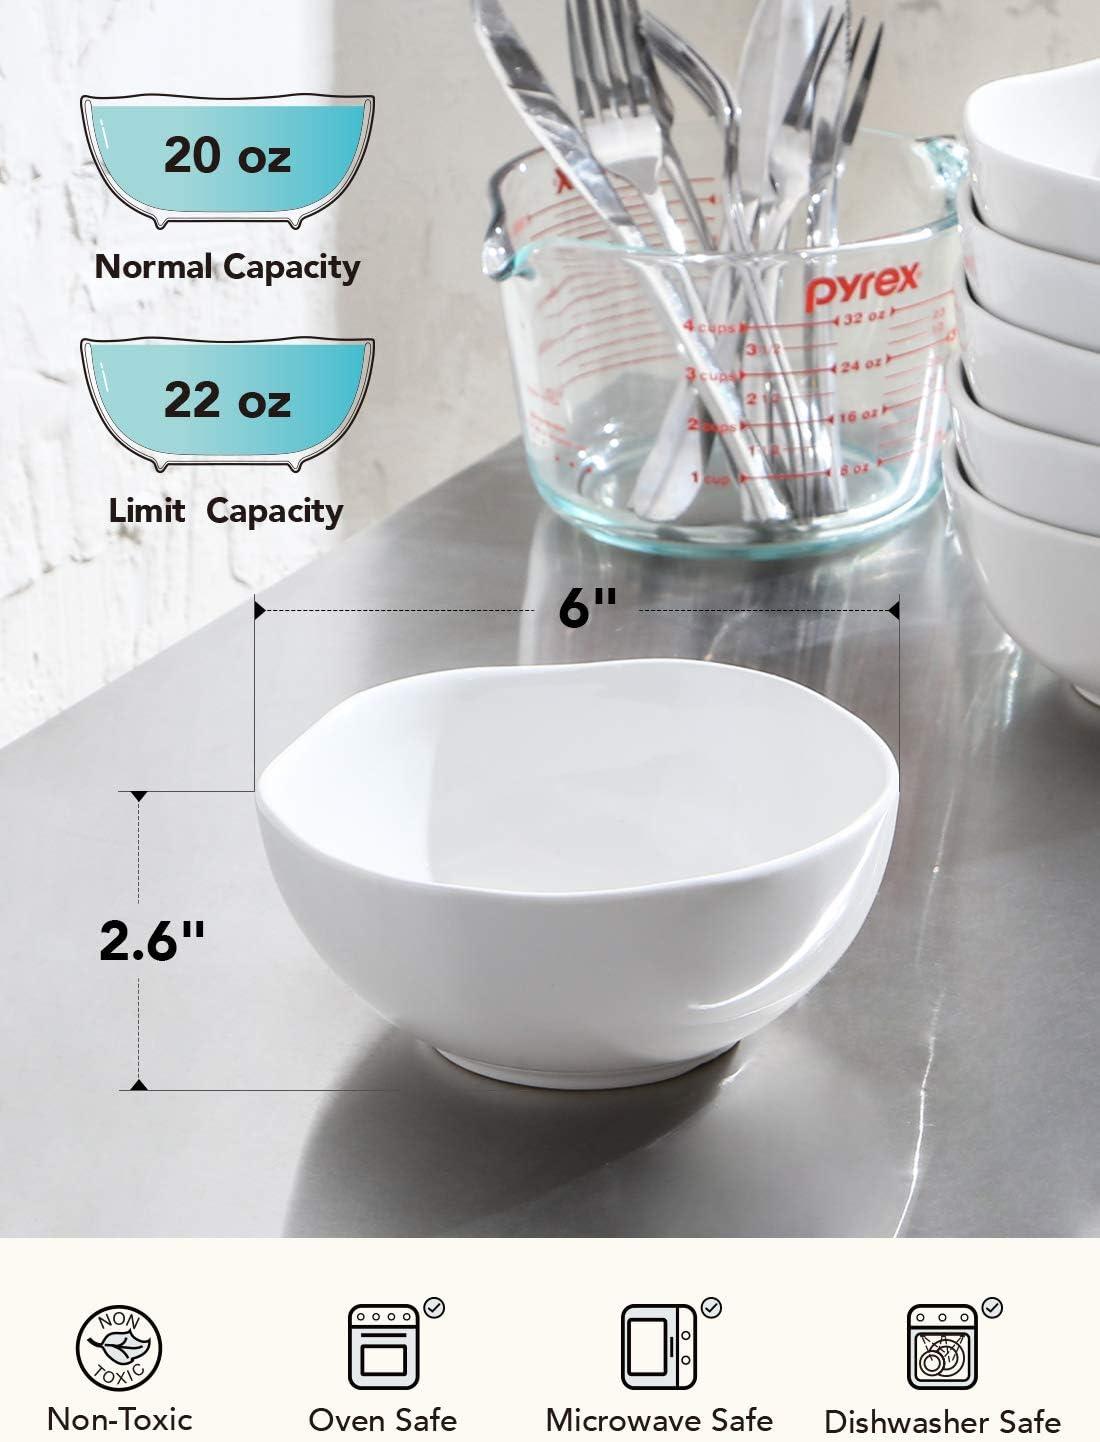 LE TAUCI 12 Piece Dinnerware Set Service for Four person 4 pcs dinner plates /& 4 salad dish /& 4 bowl sets WHITE